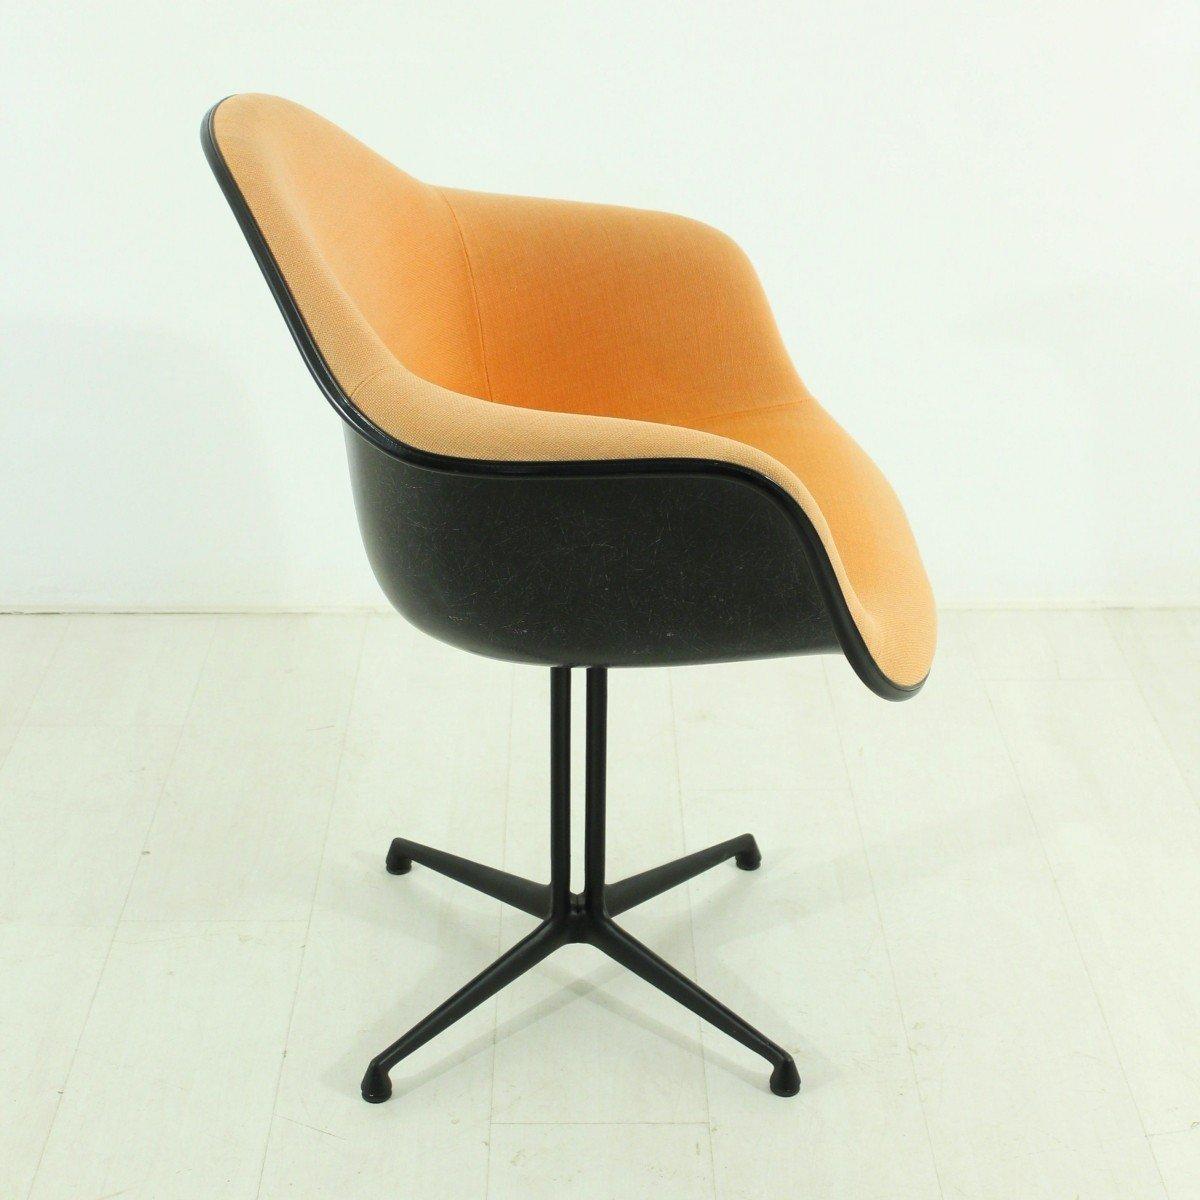 Chaise terracotta la fonda vintage par charles ray eames for Chaise vitra eames prix